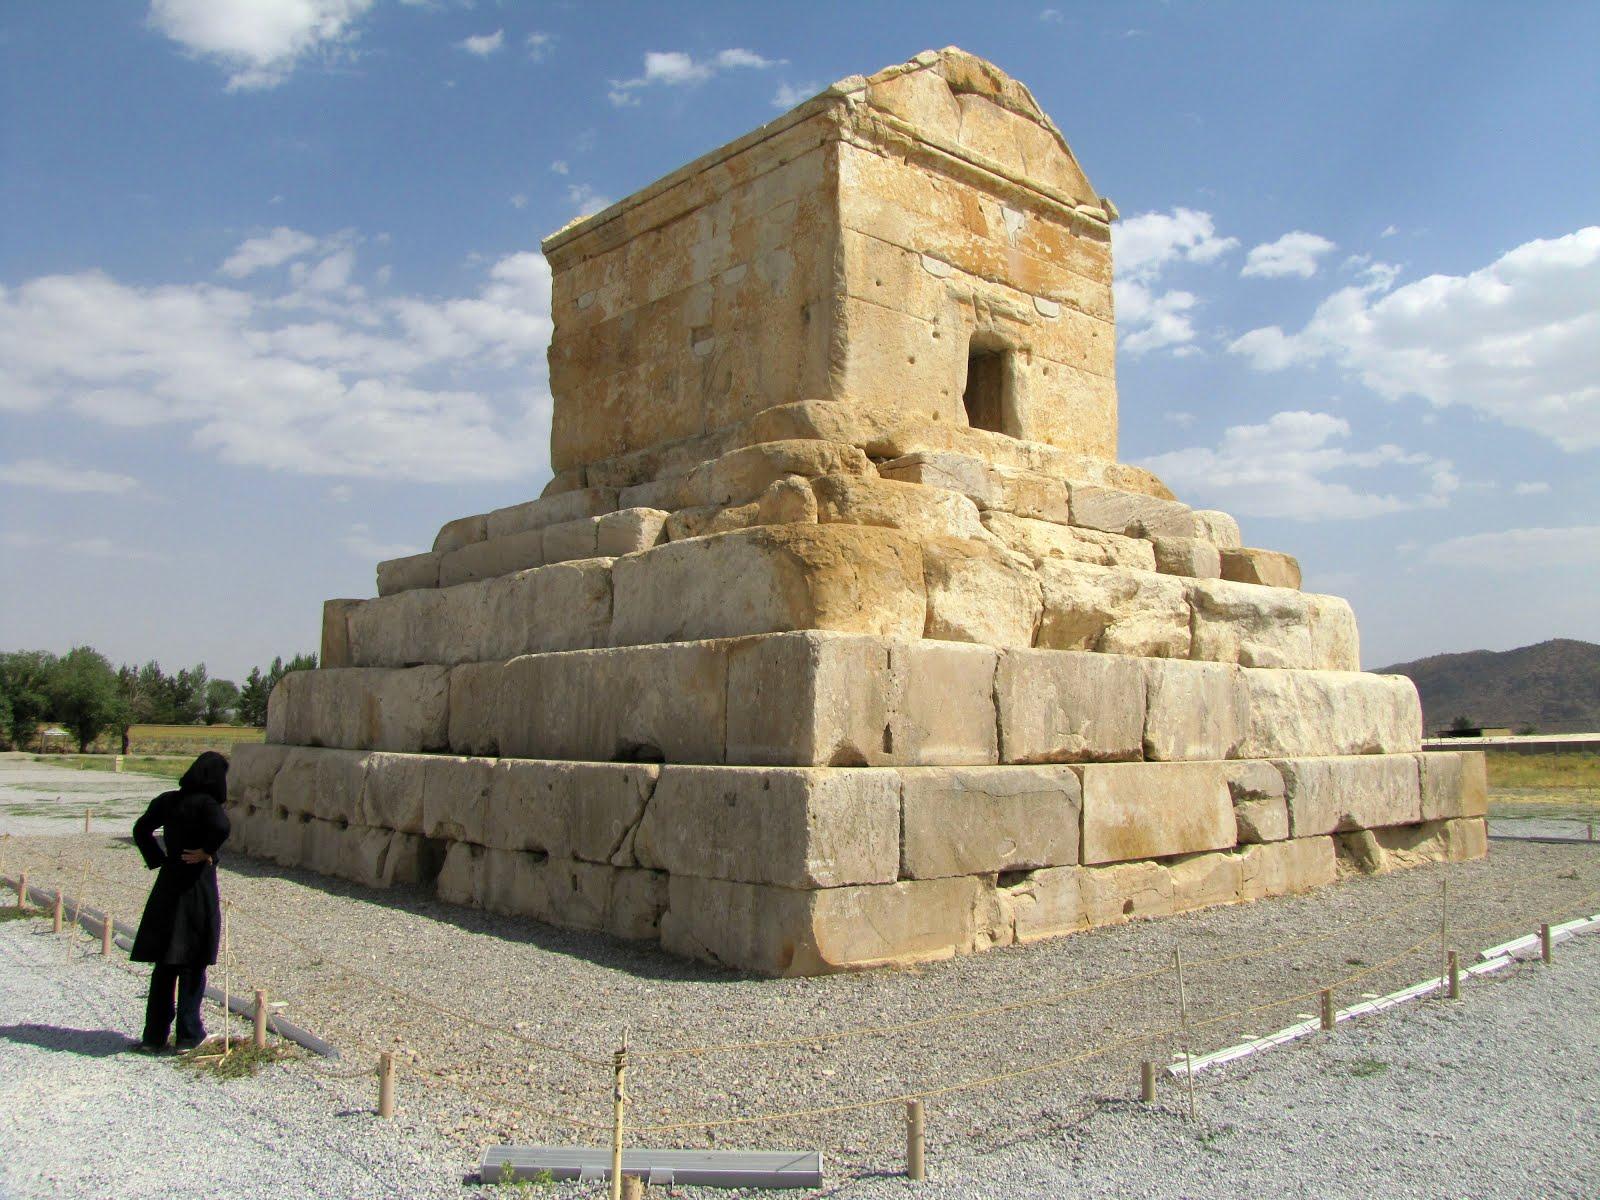 Travel Iran: Pasargadae - Tomb of Cyrus the Great